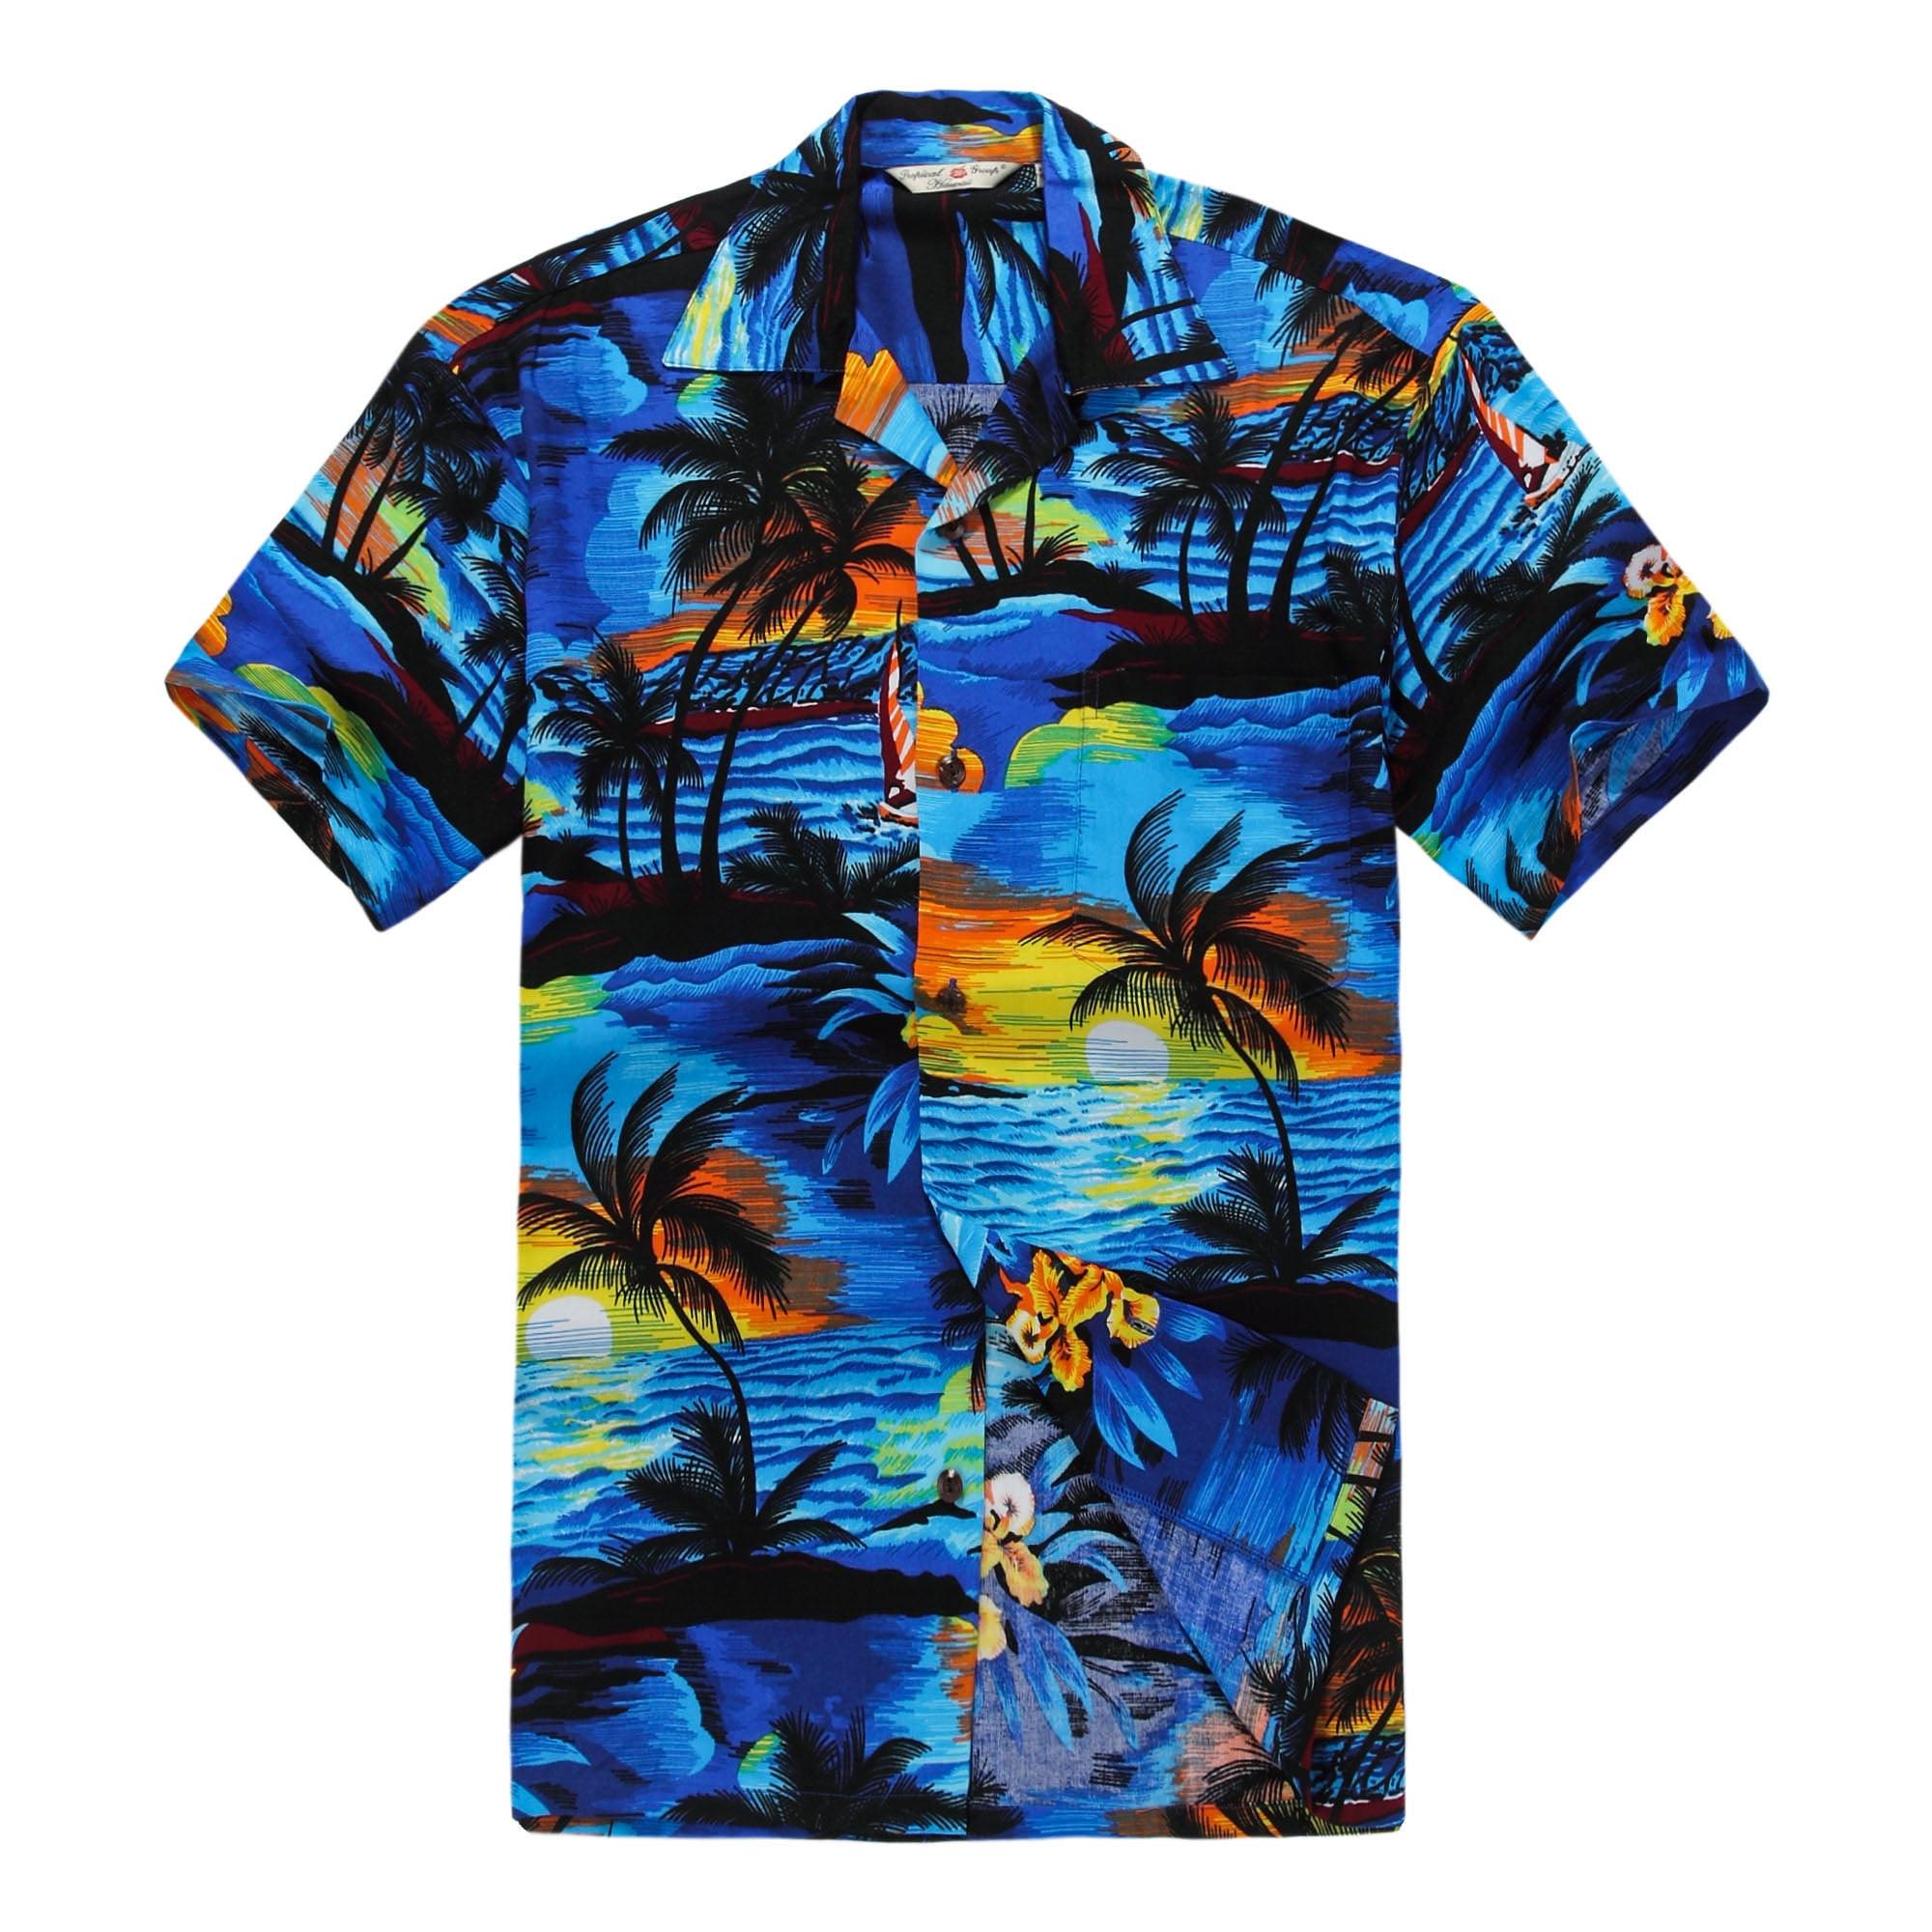 Walmart Shirts For Men